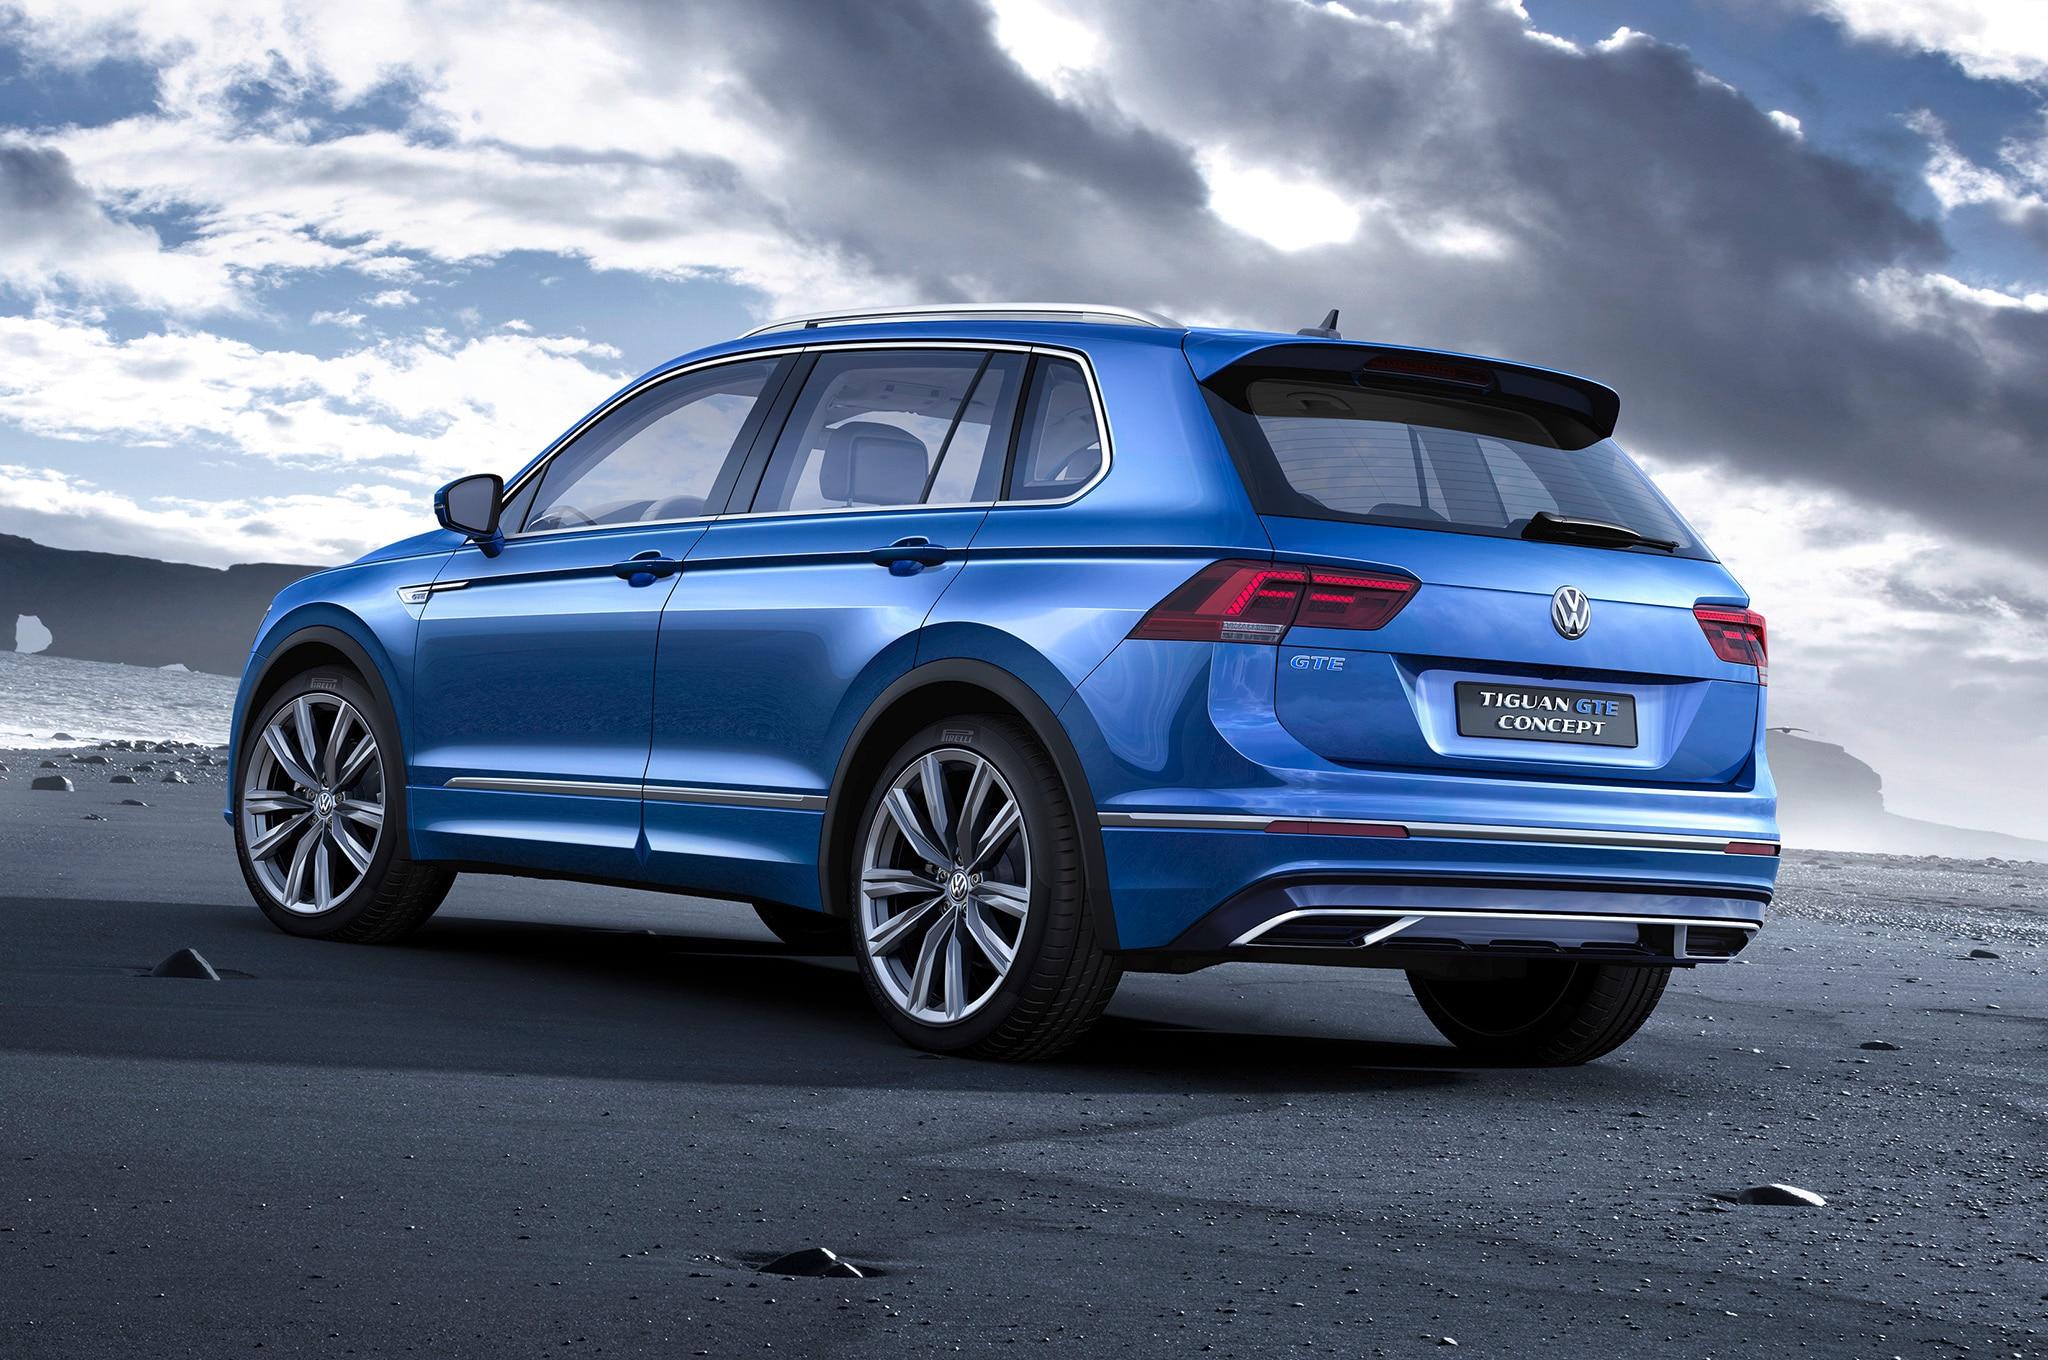 Report: Volkswagen to Expand Tiguan Range of Compact SUVs